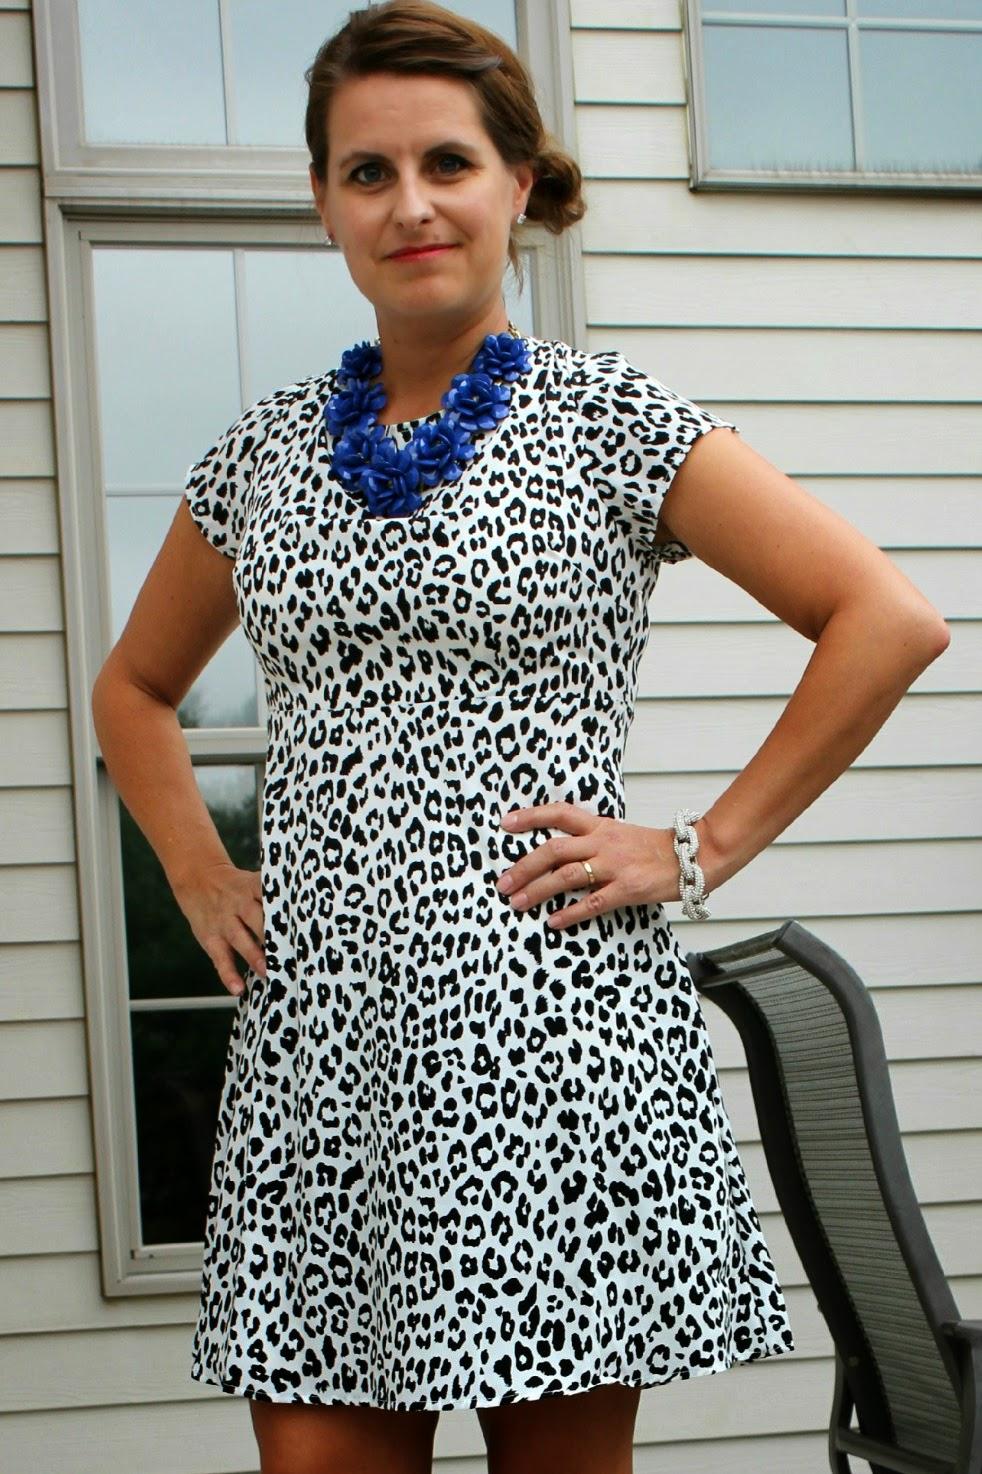 Old Navy Snow leopard dress, edgy black heels, blue florette necklace